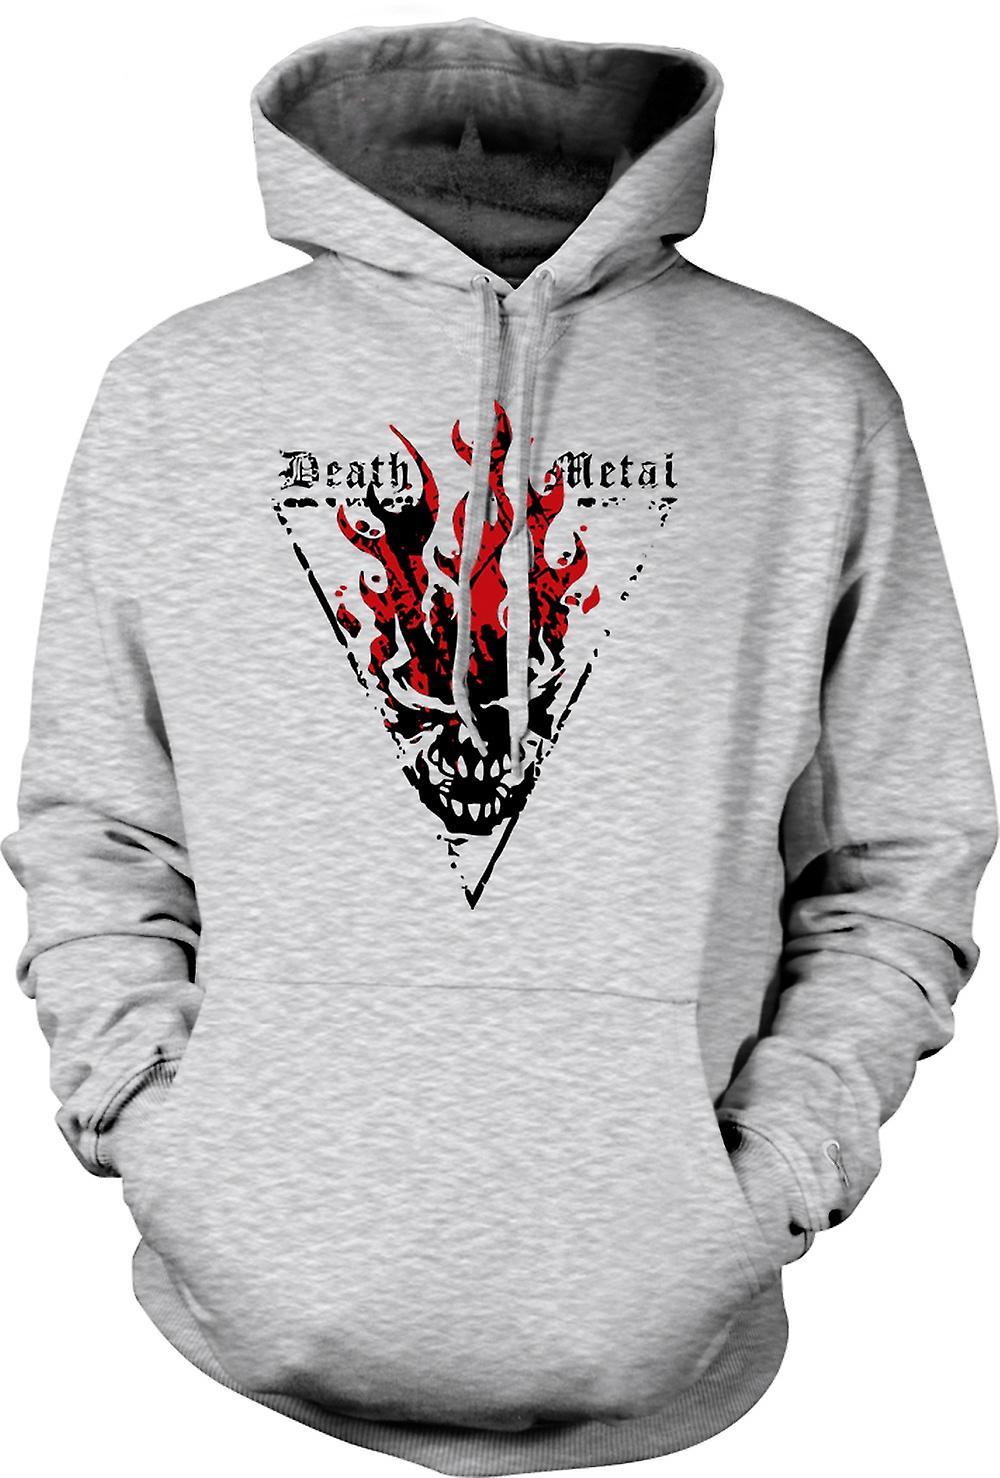 Mens-Hoodie - Death-Metal - Thrash Devil Gothic